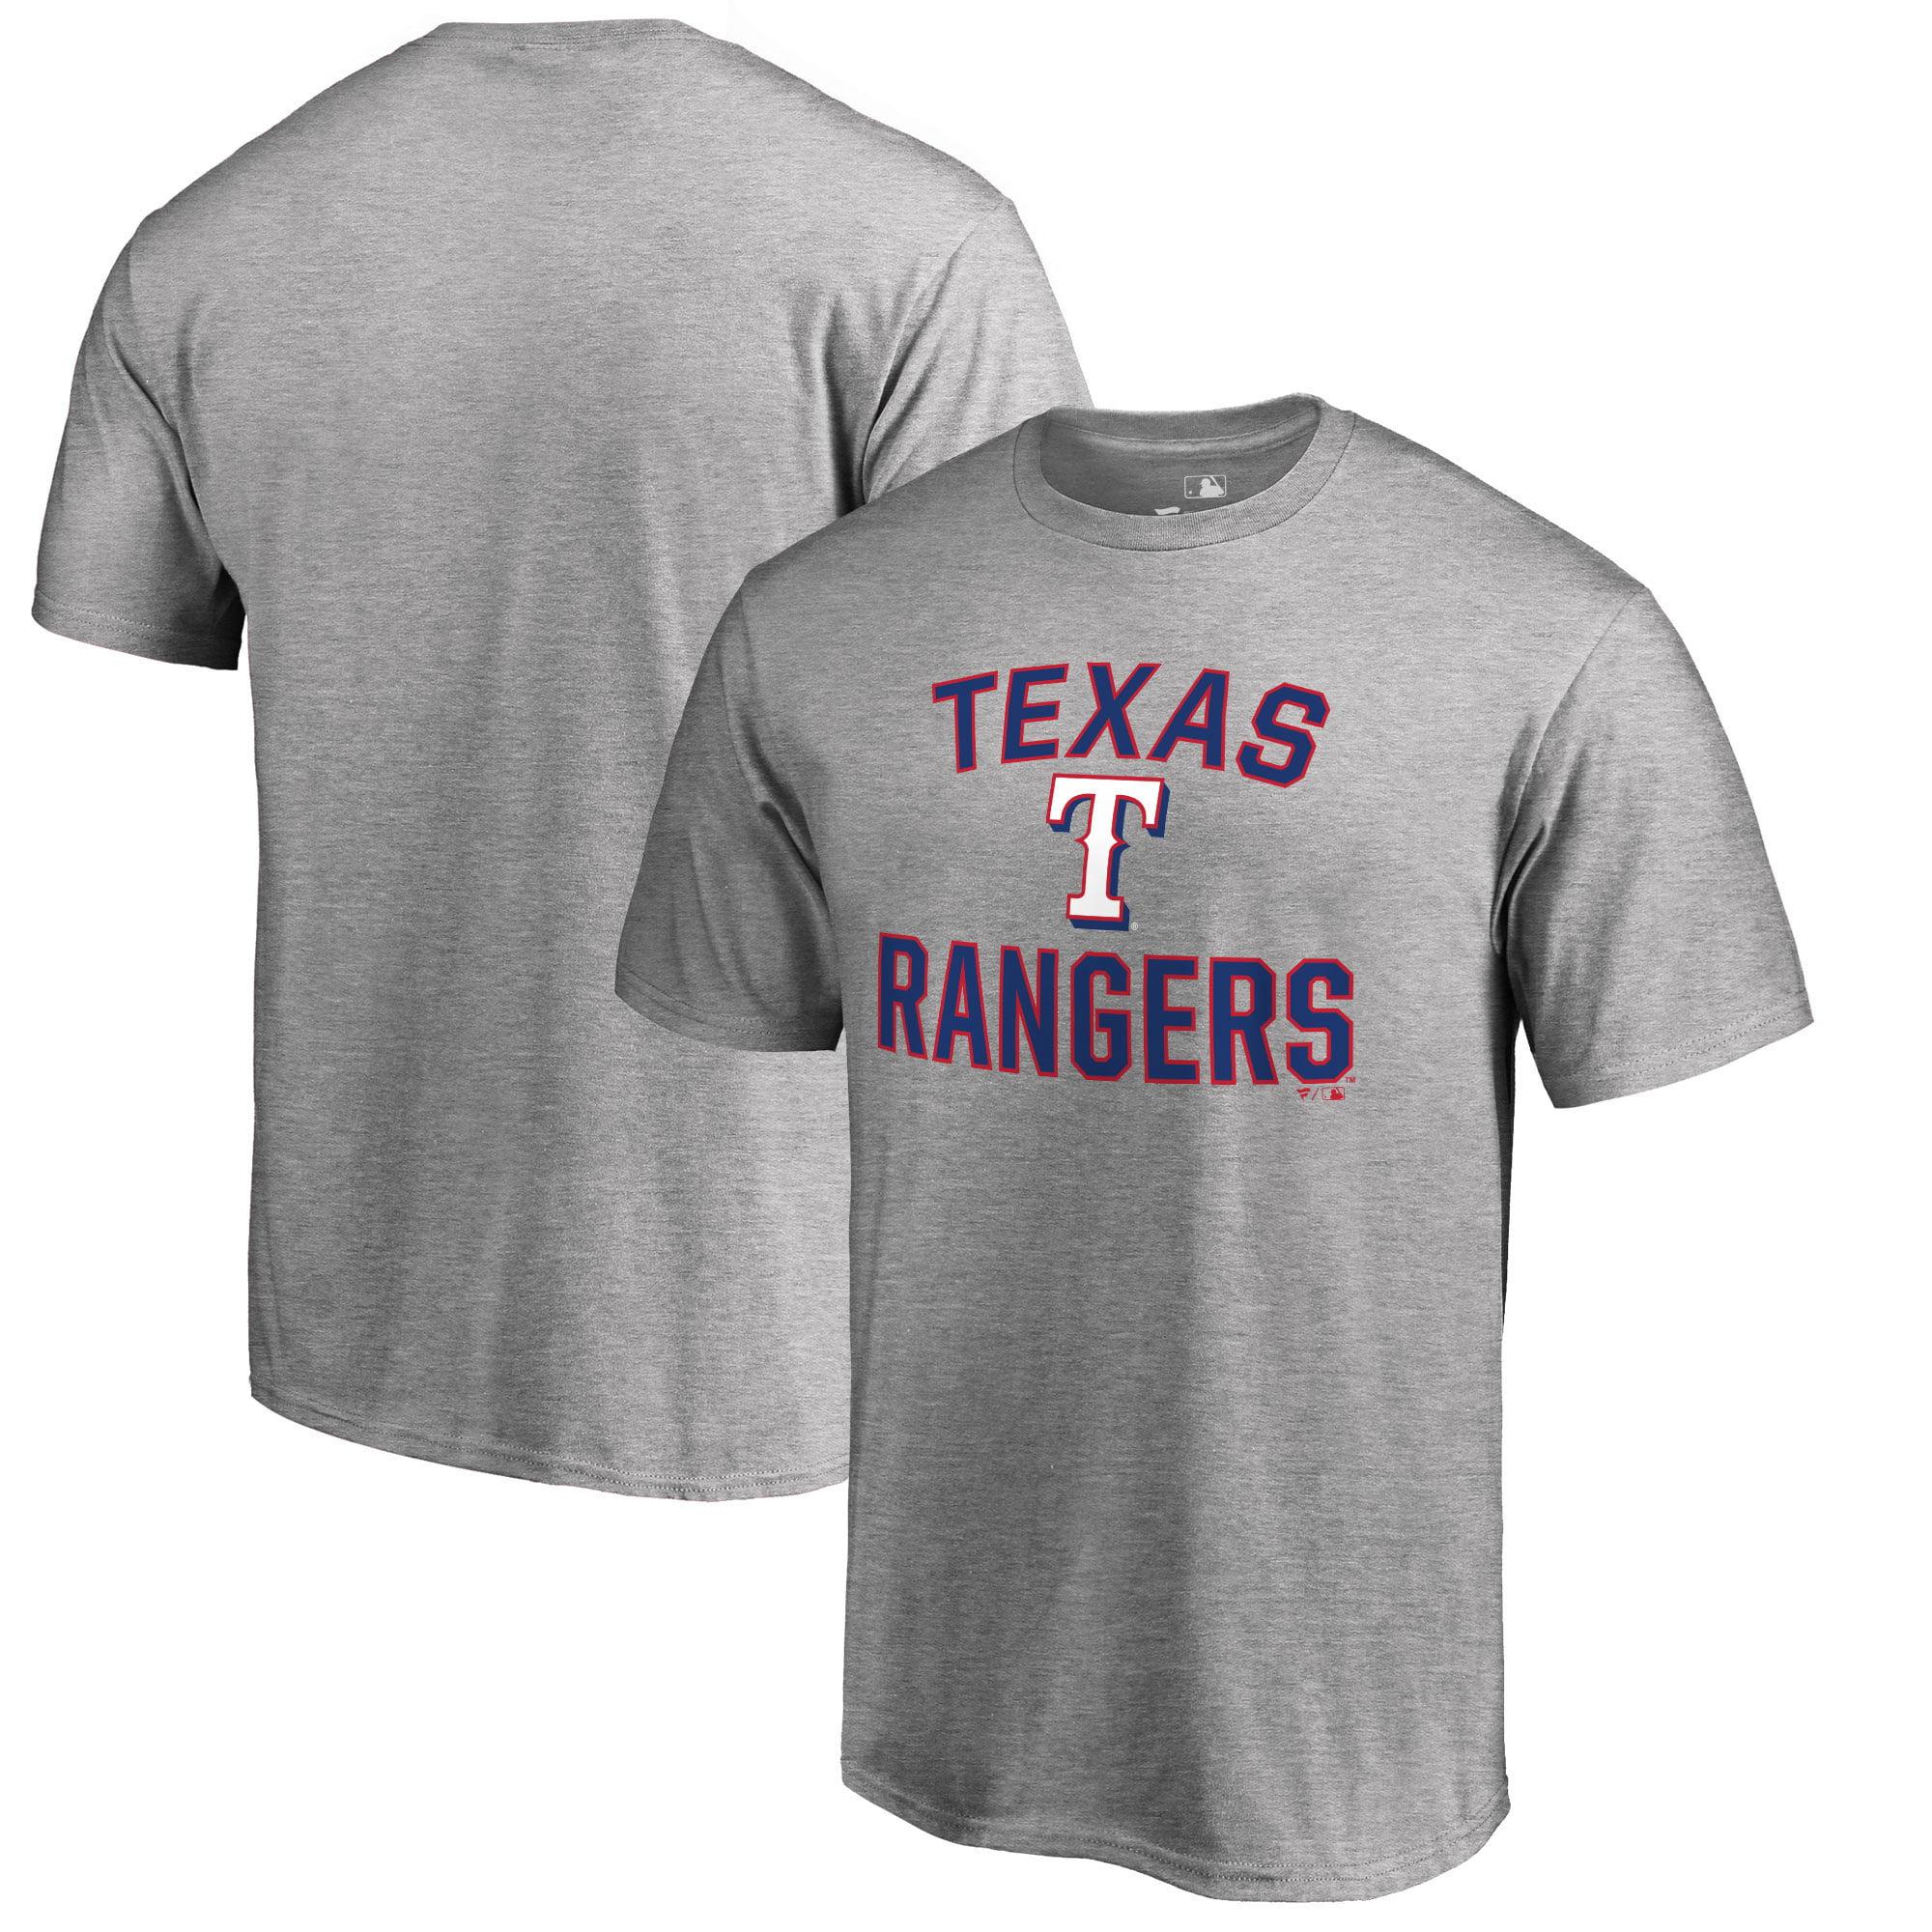 Texas Rangers Fanatics Branded Victory Arch T-Shirt - Heathered Gray